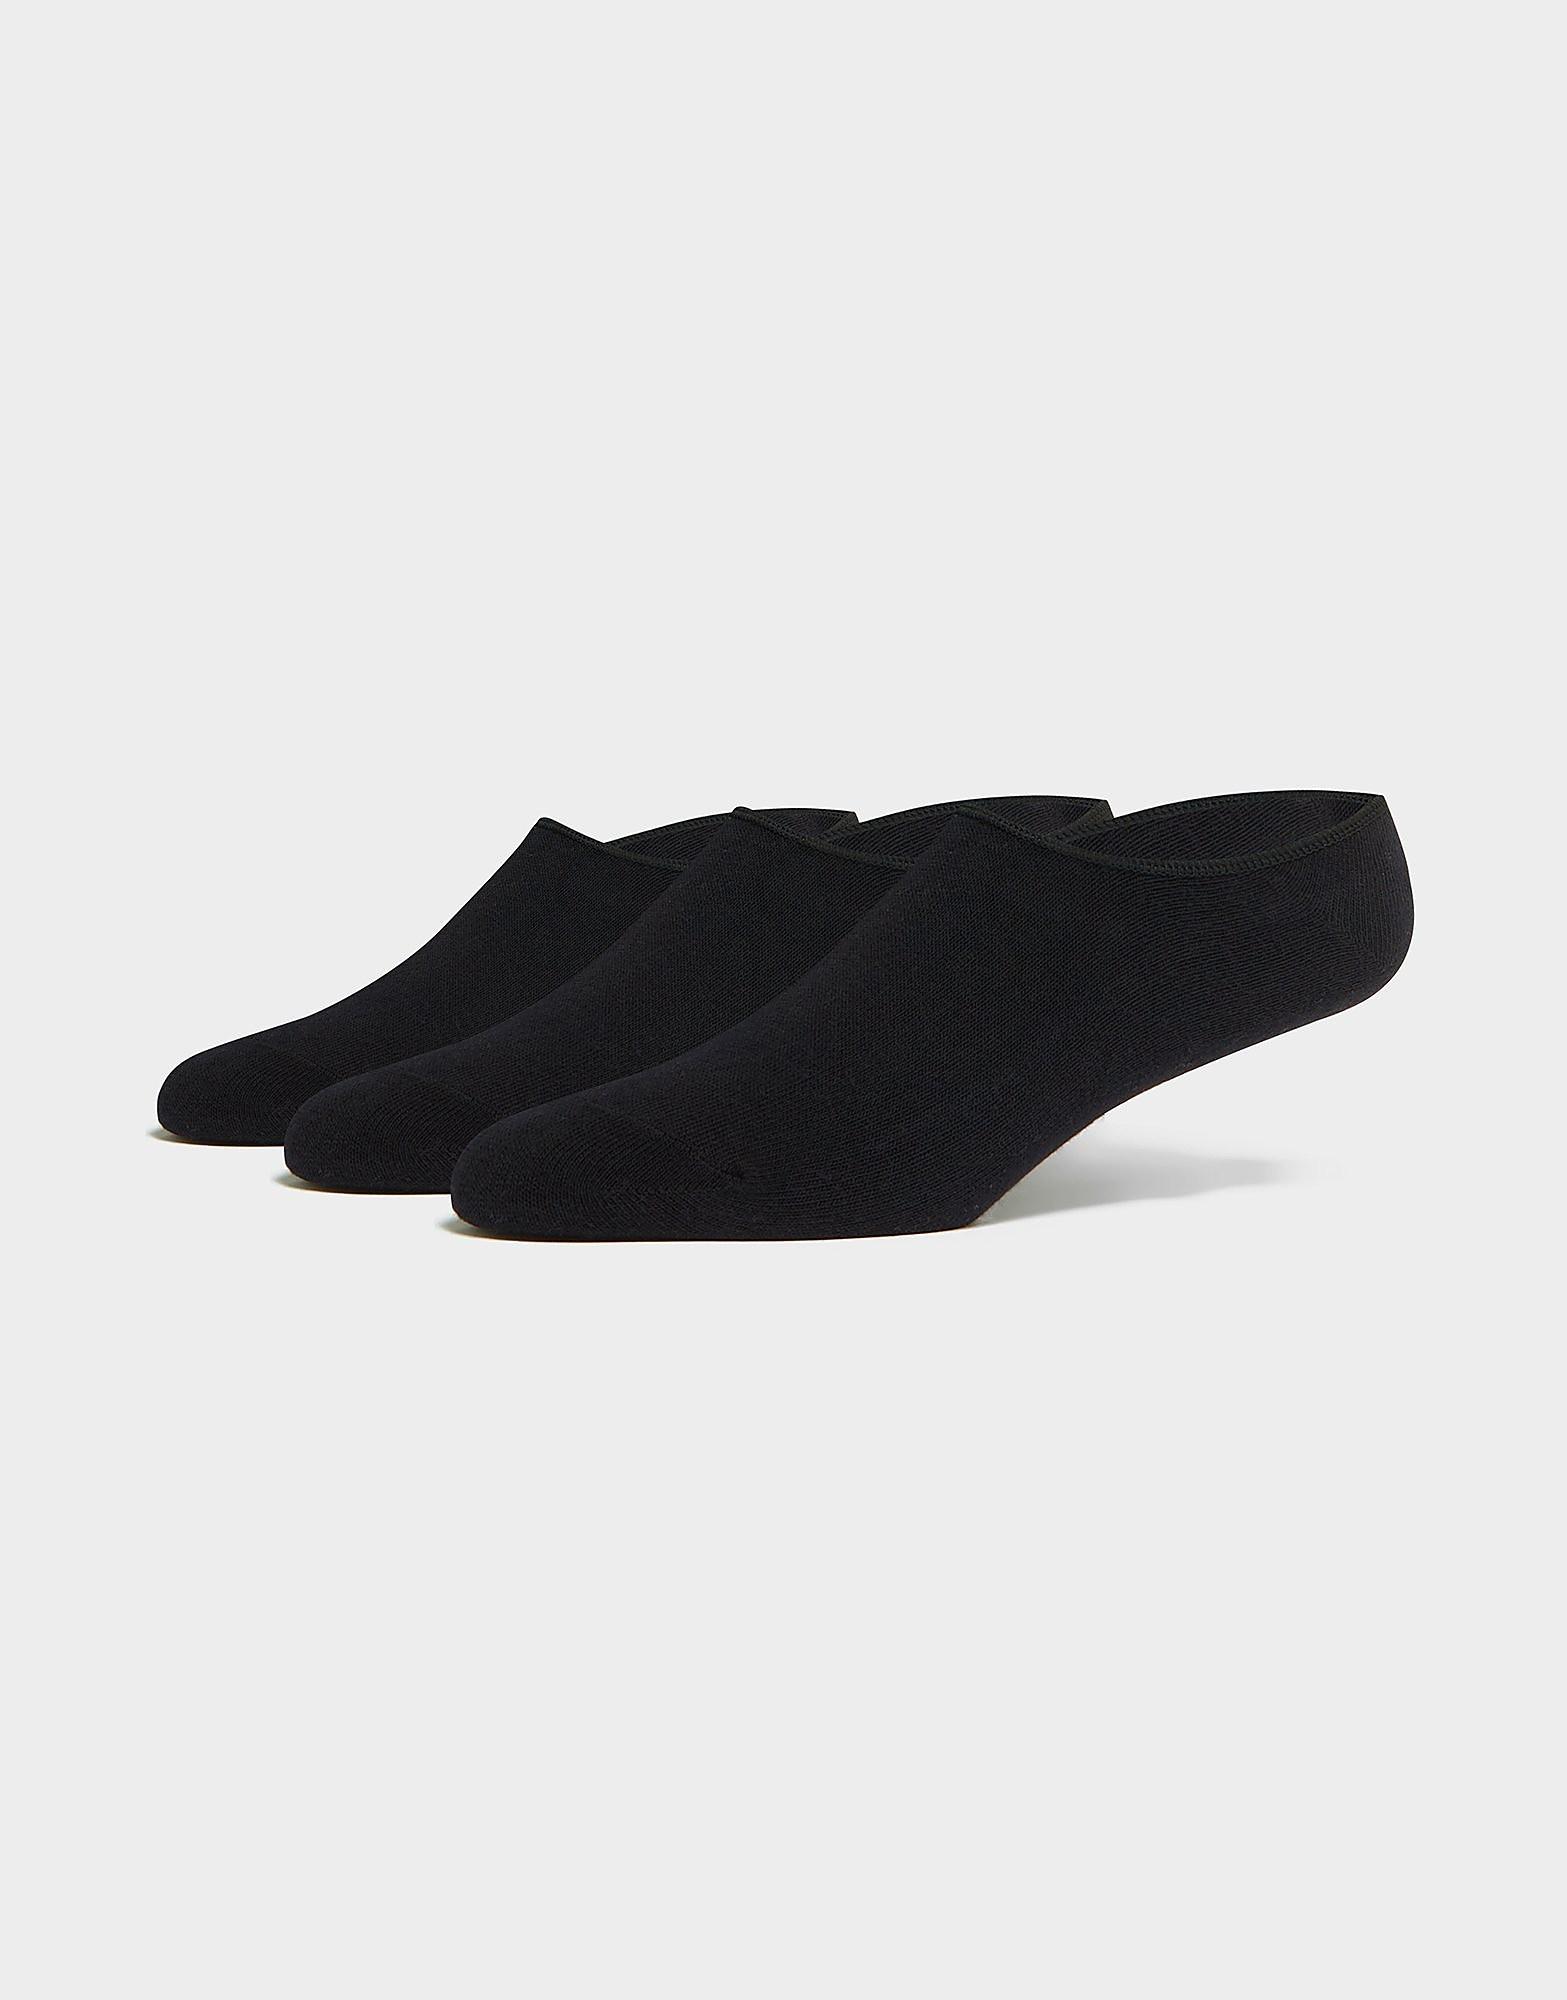 McKenzie 3 Pack Invisible Socks